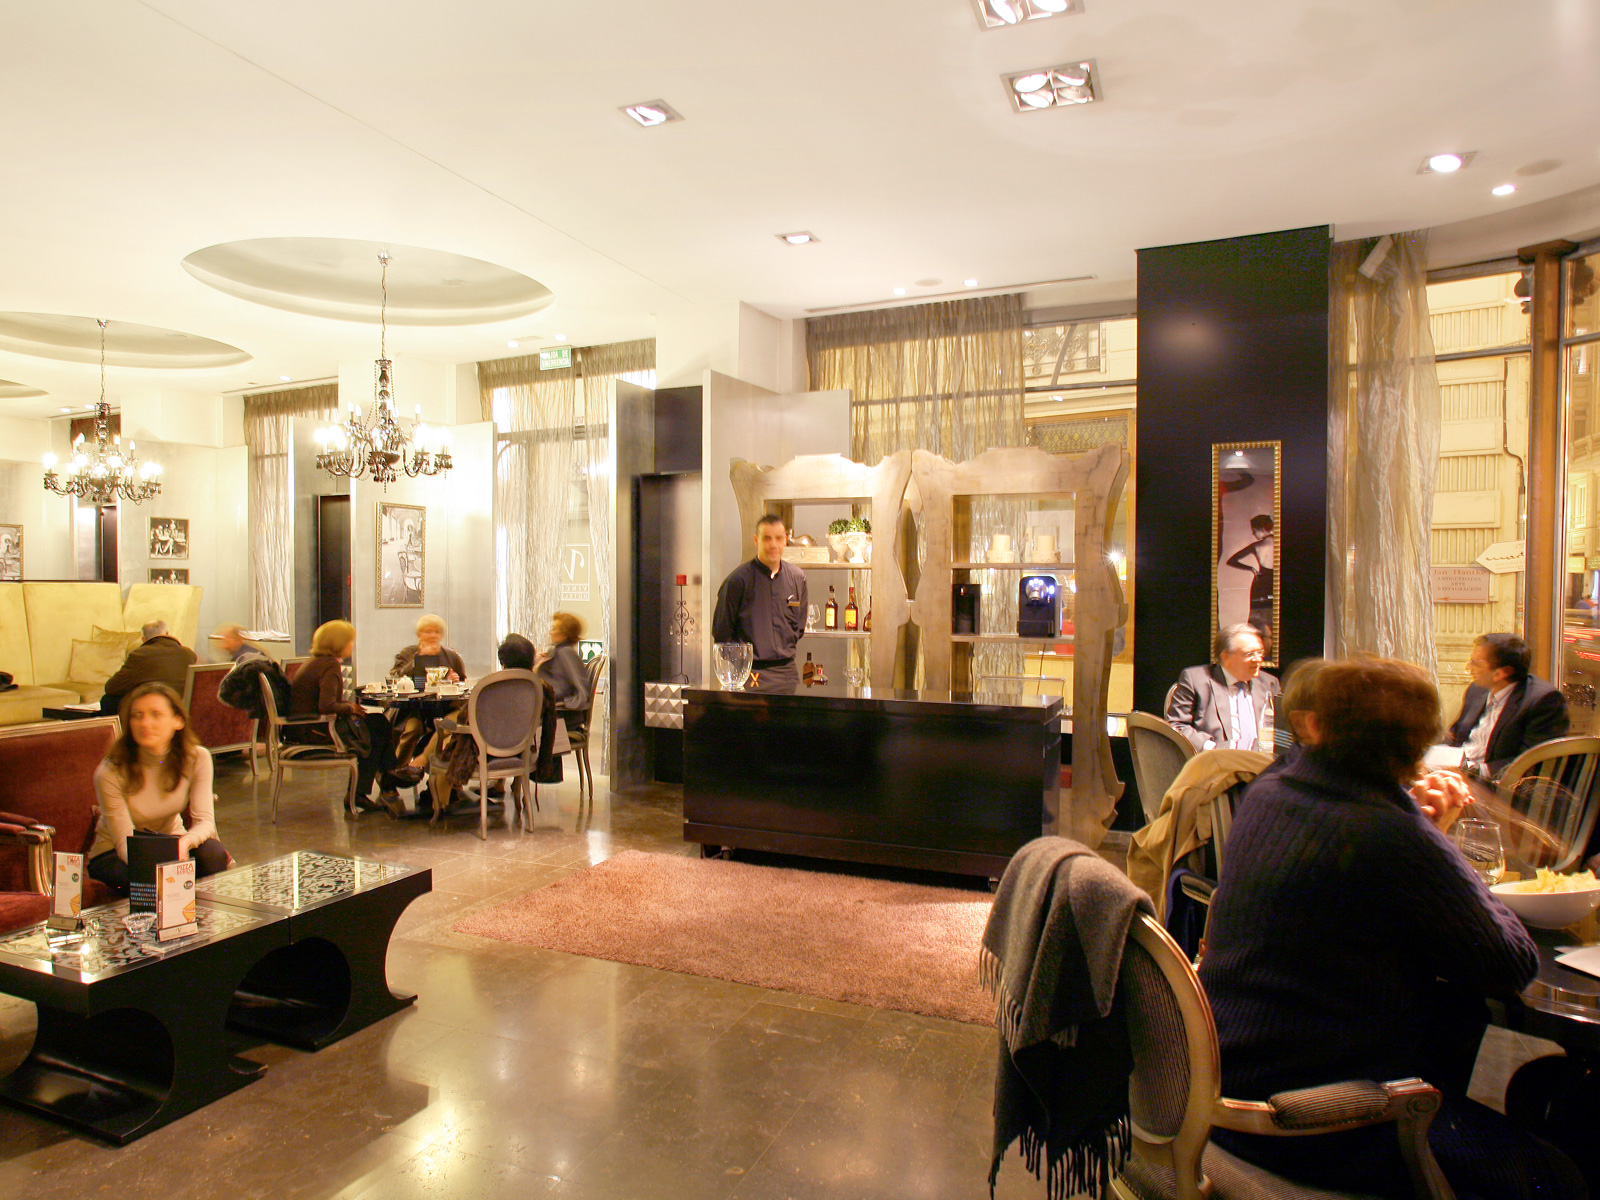 Bar-Cafetería - Vincci Palace 4*